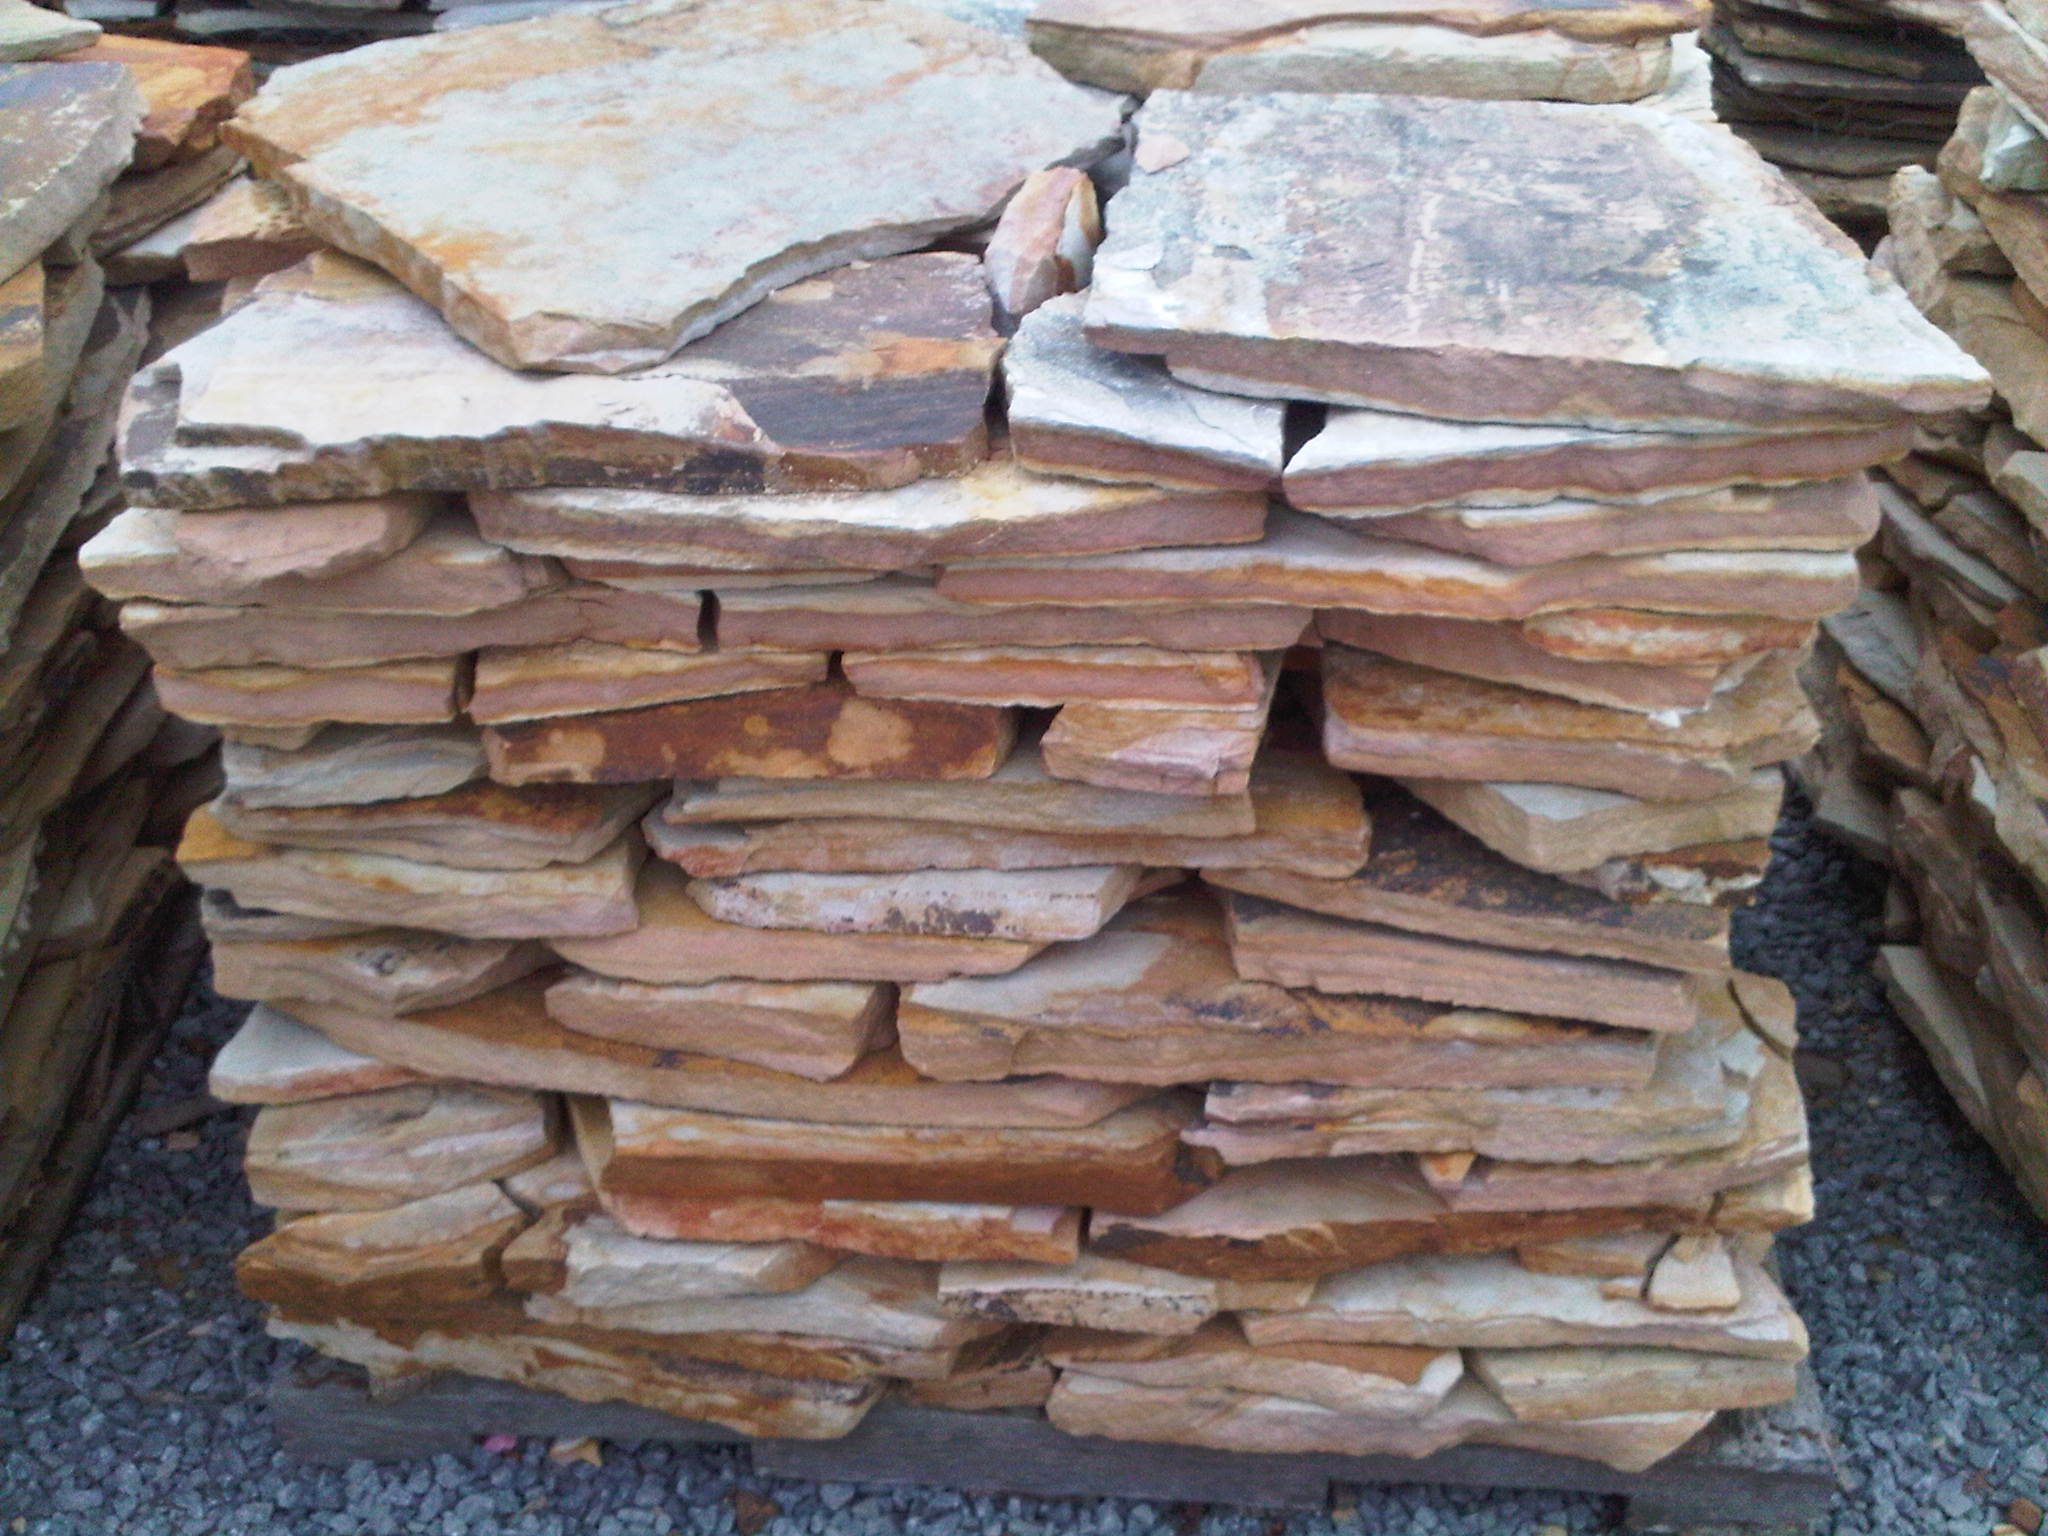 Southern Natural Stone : Natural stone southern landscape supply